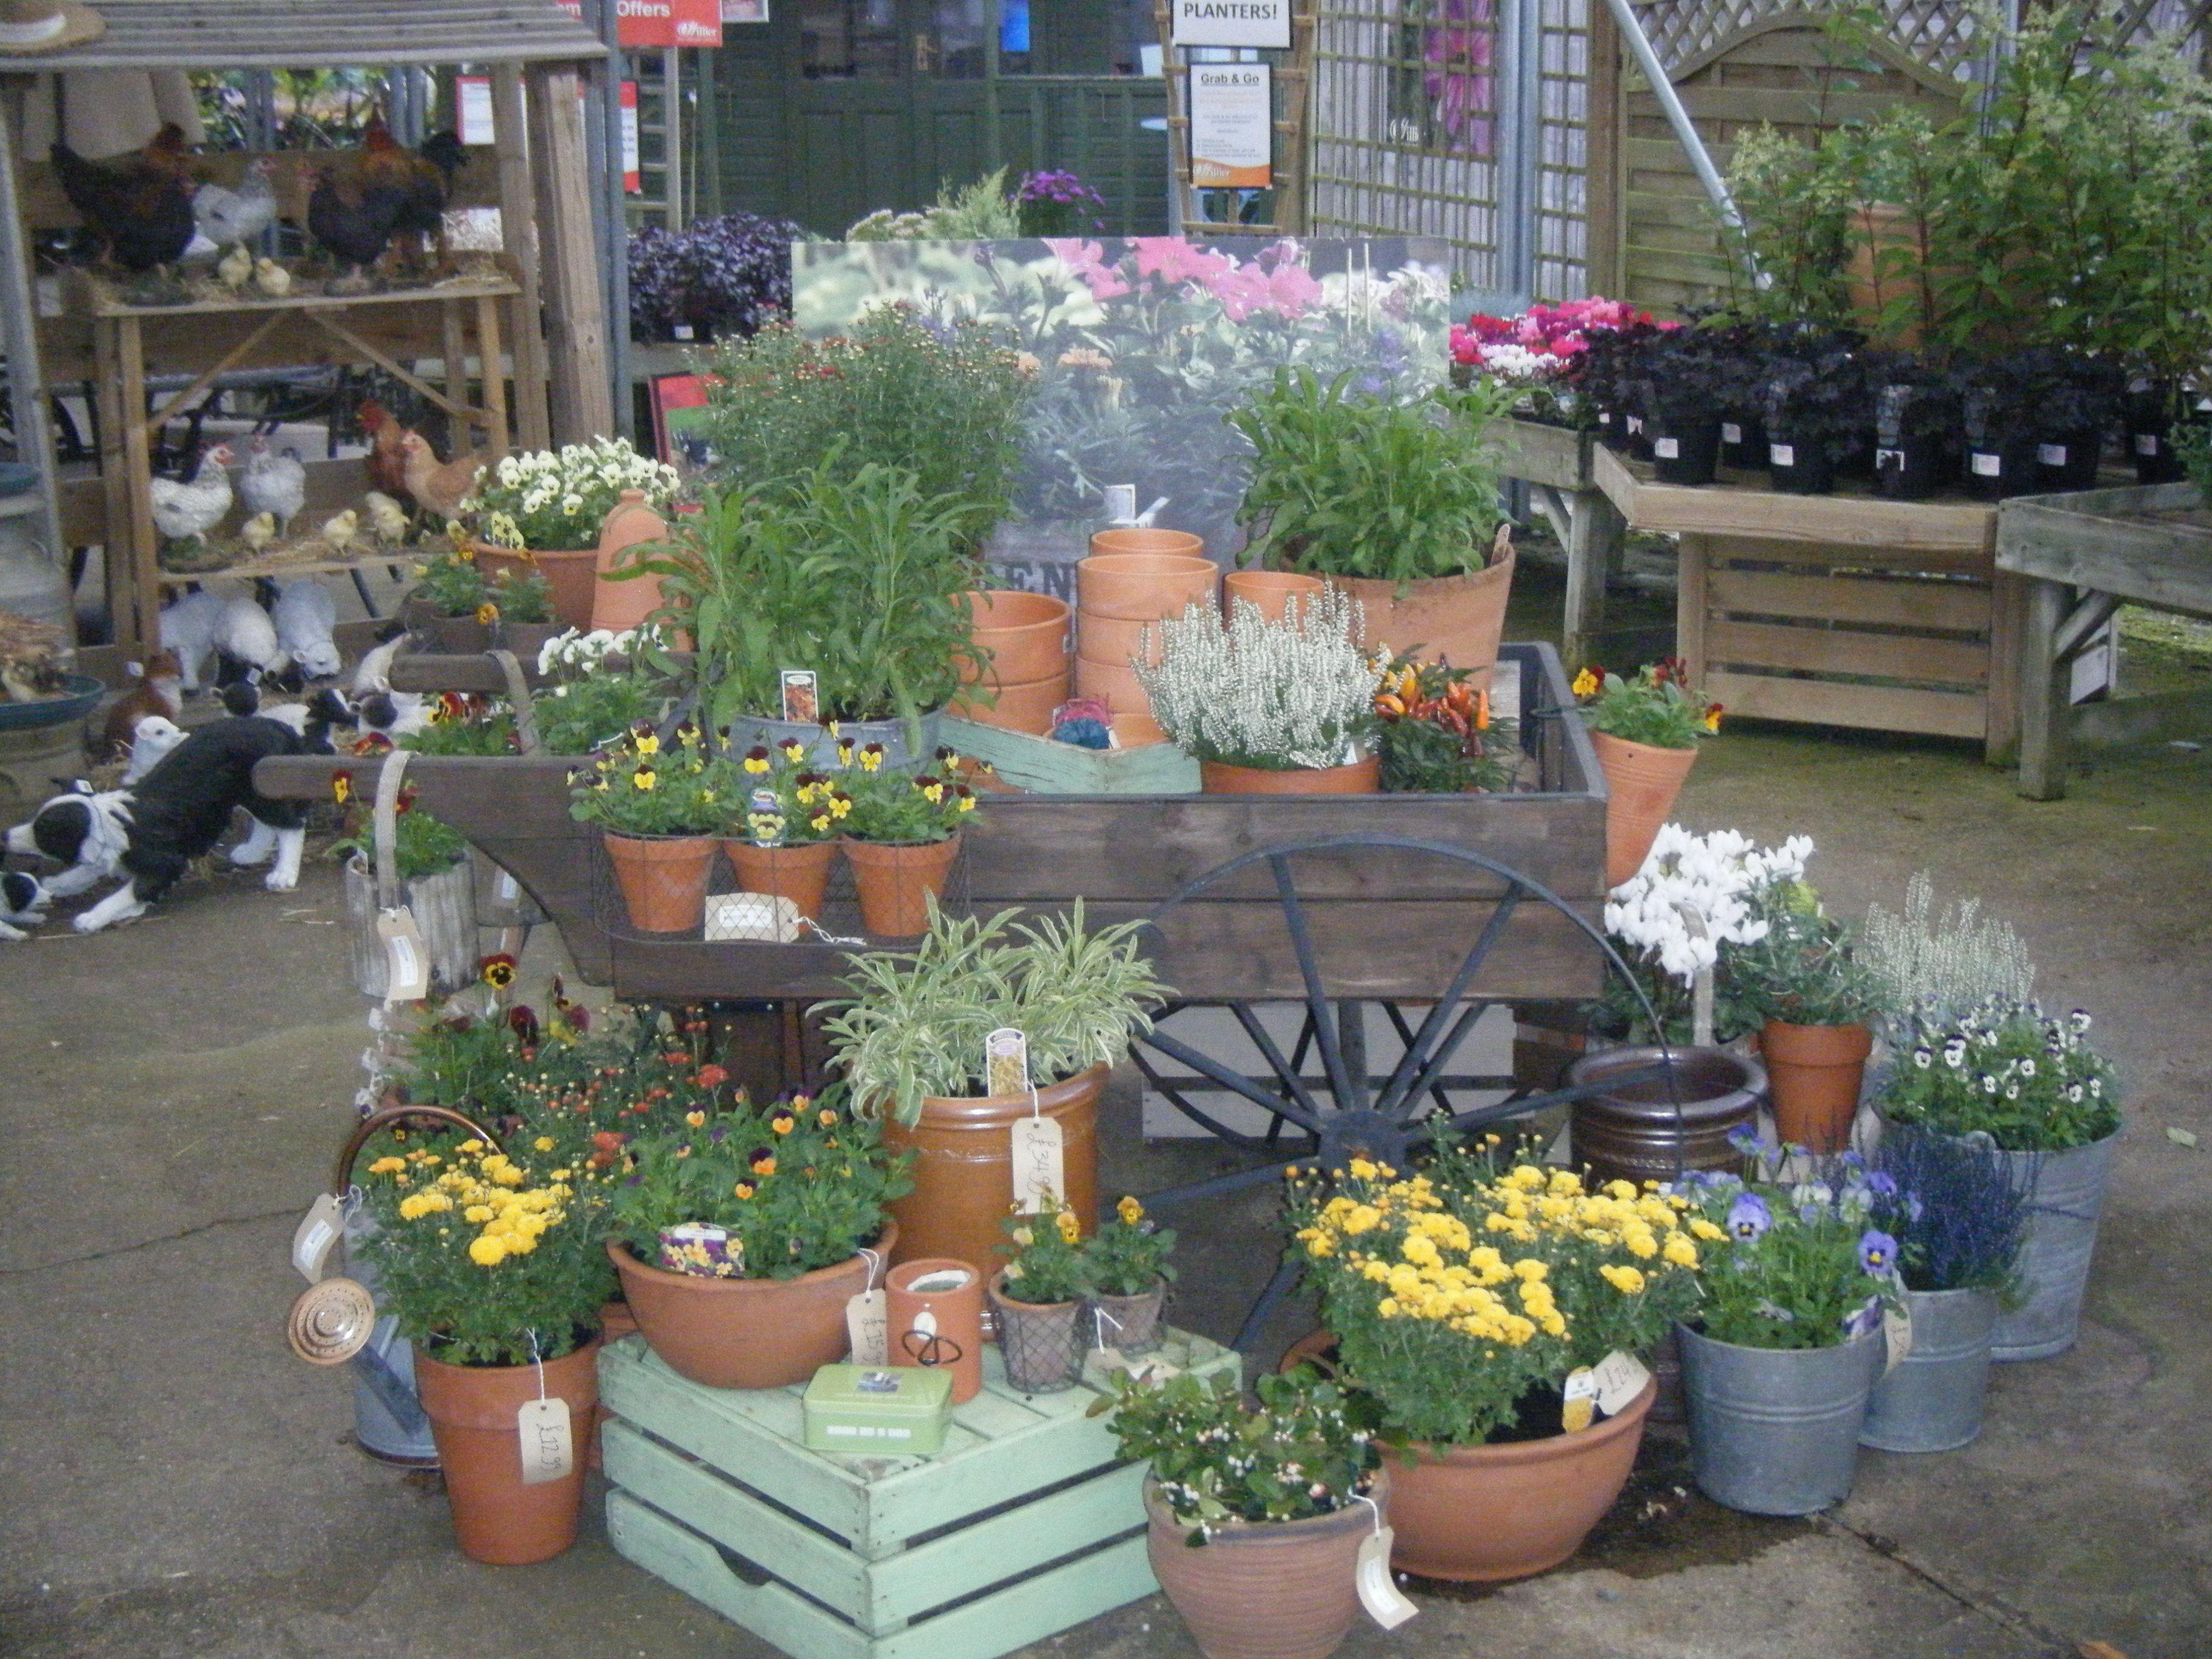 Hillier Garden Centre Autumn Container Displays 2013 Garden Center Displays Display Ideas Nursery Garden Store